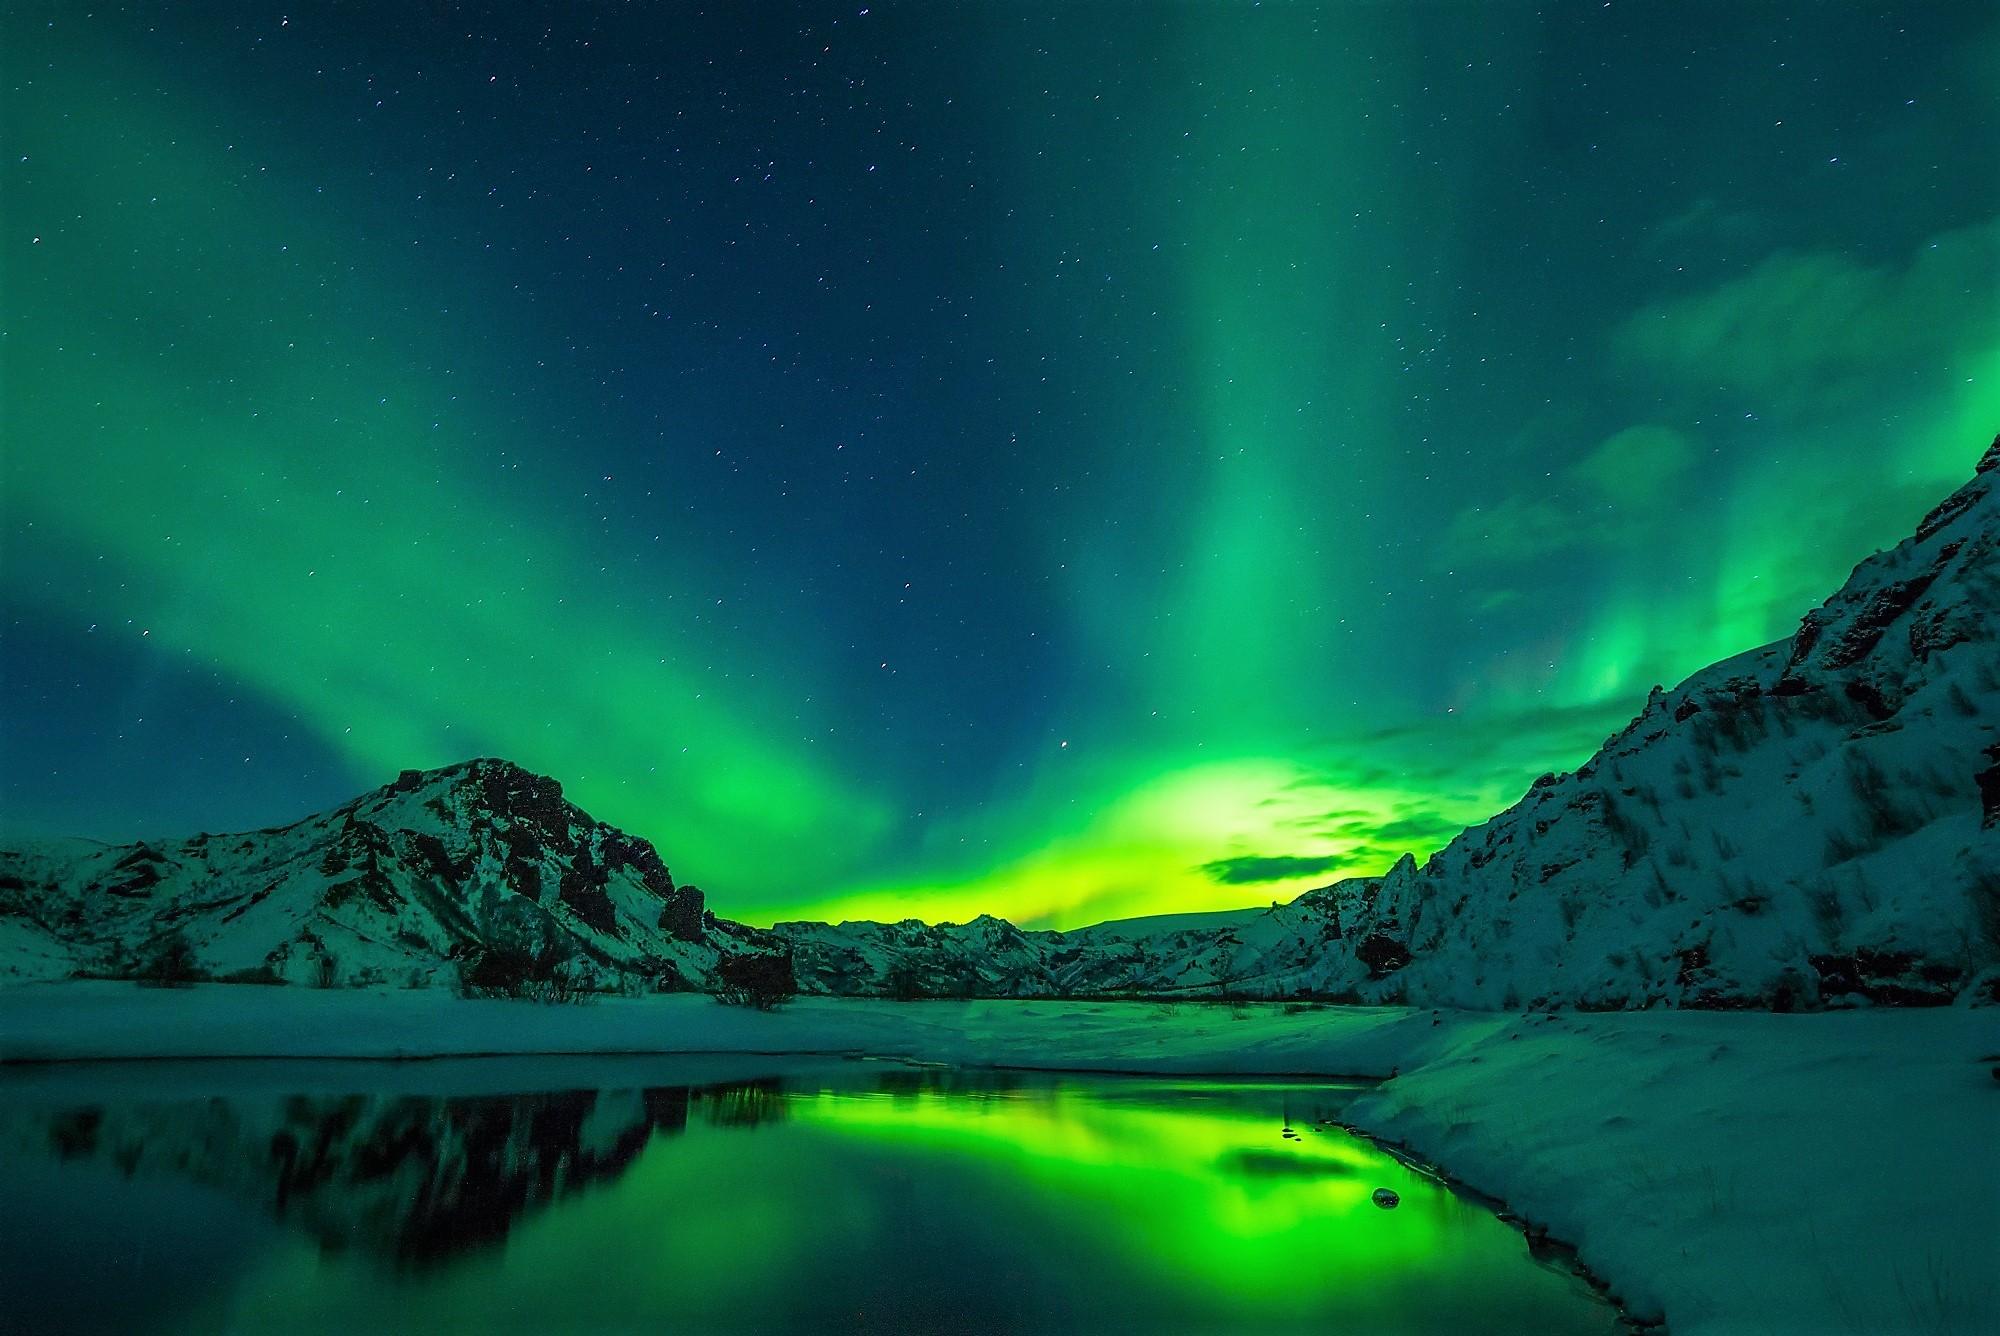 Noorderlicht IJsland journeys.be